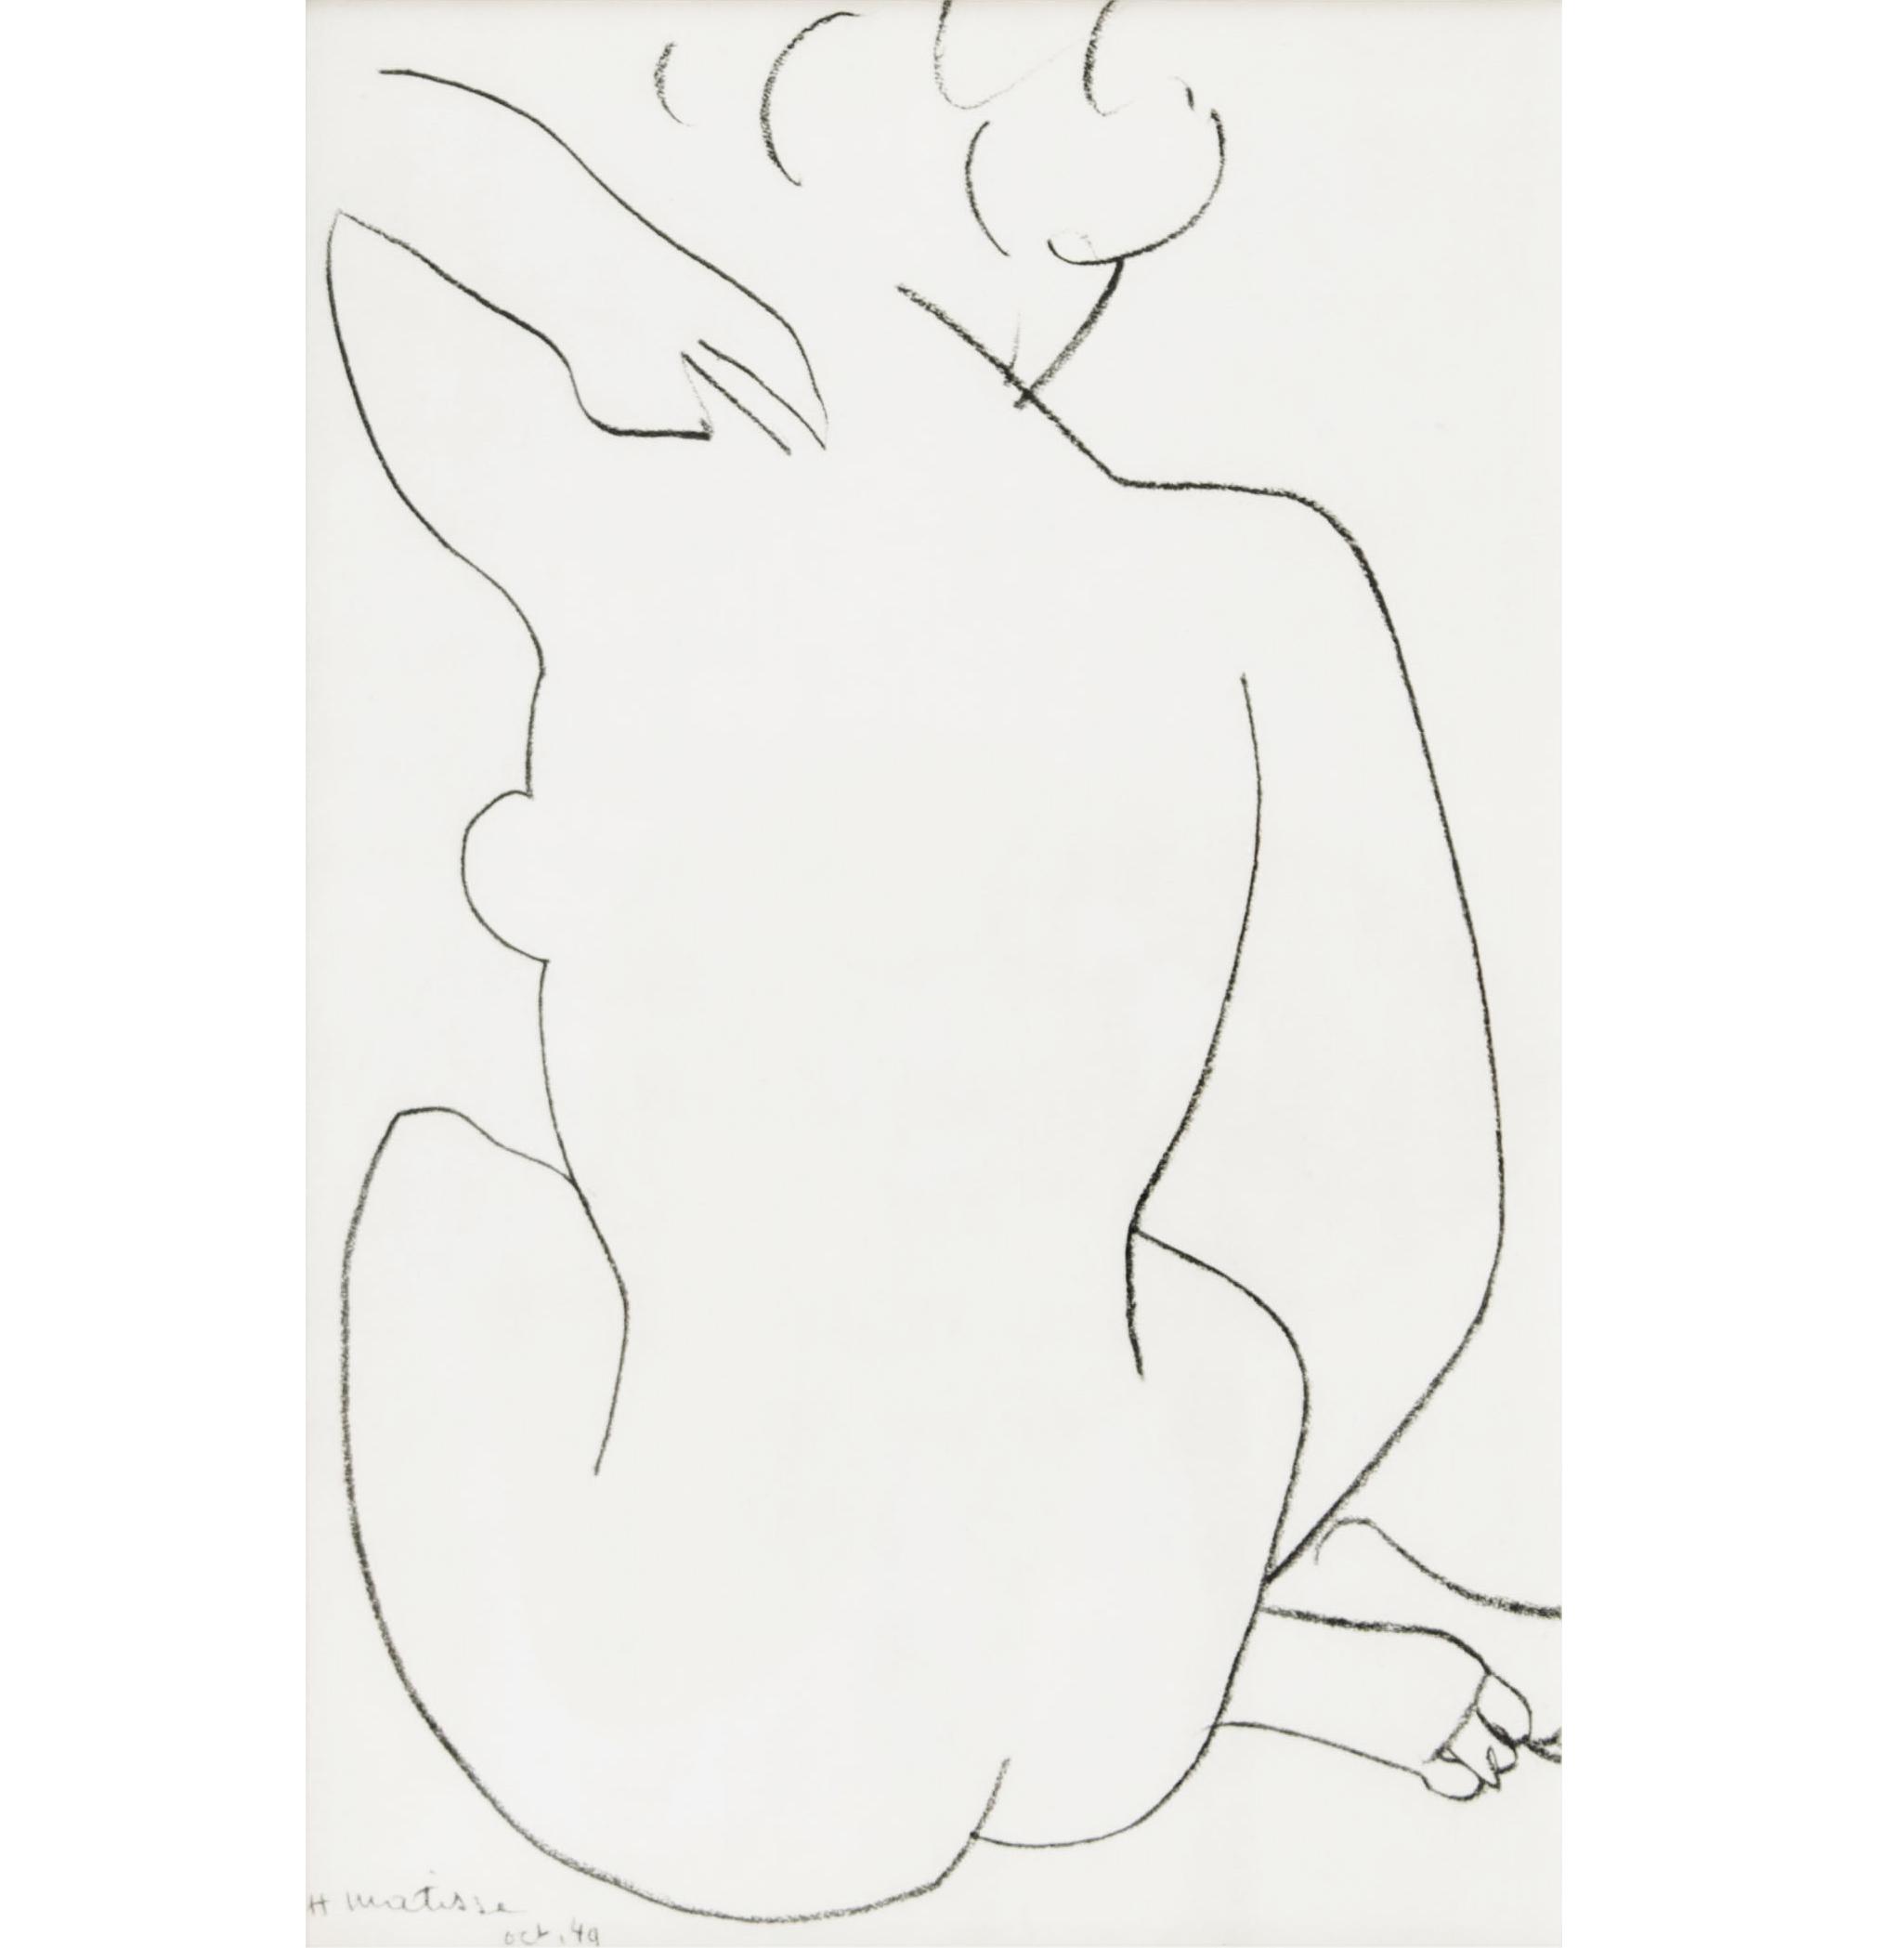 Henri-Matisse-cutouts-drawing-torso-back-web.jpg